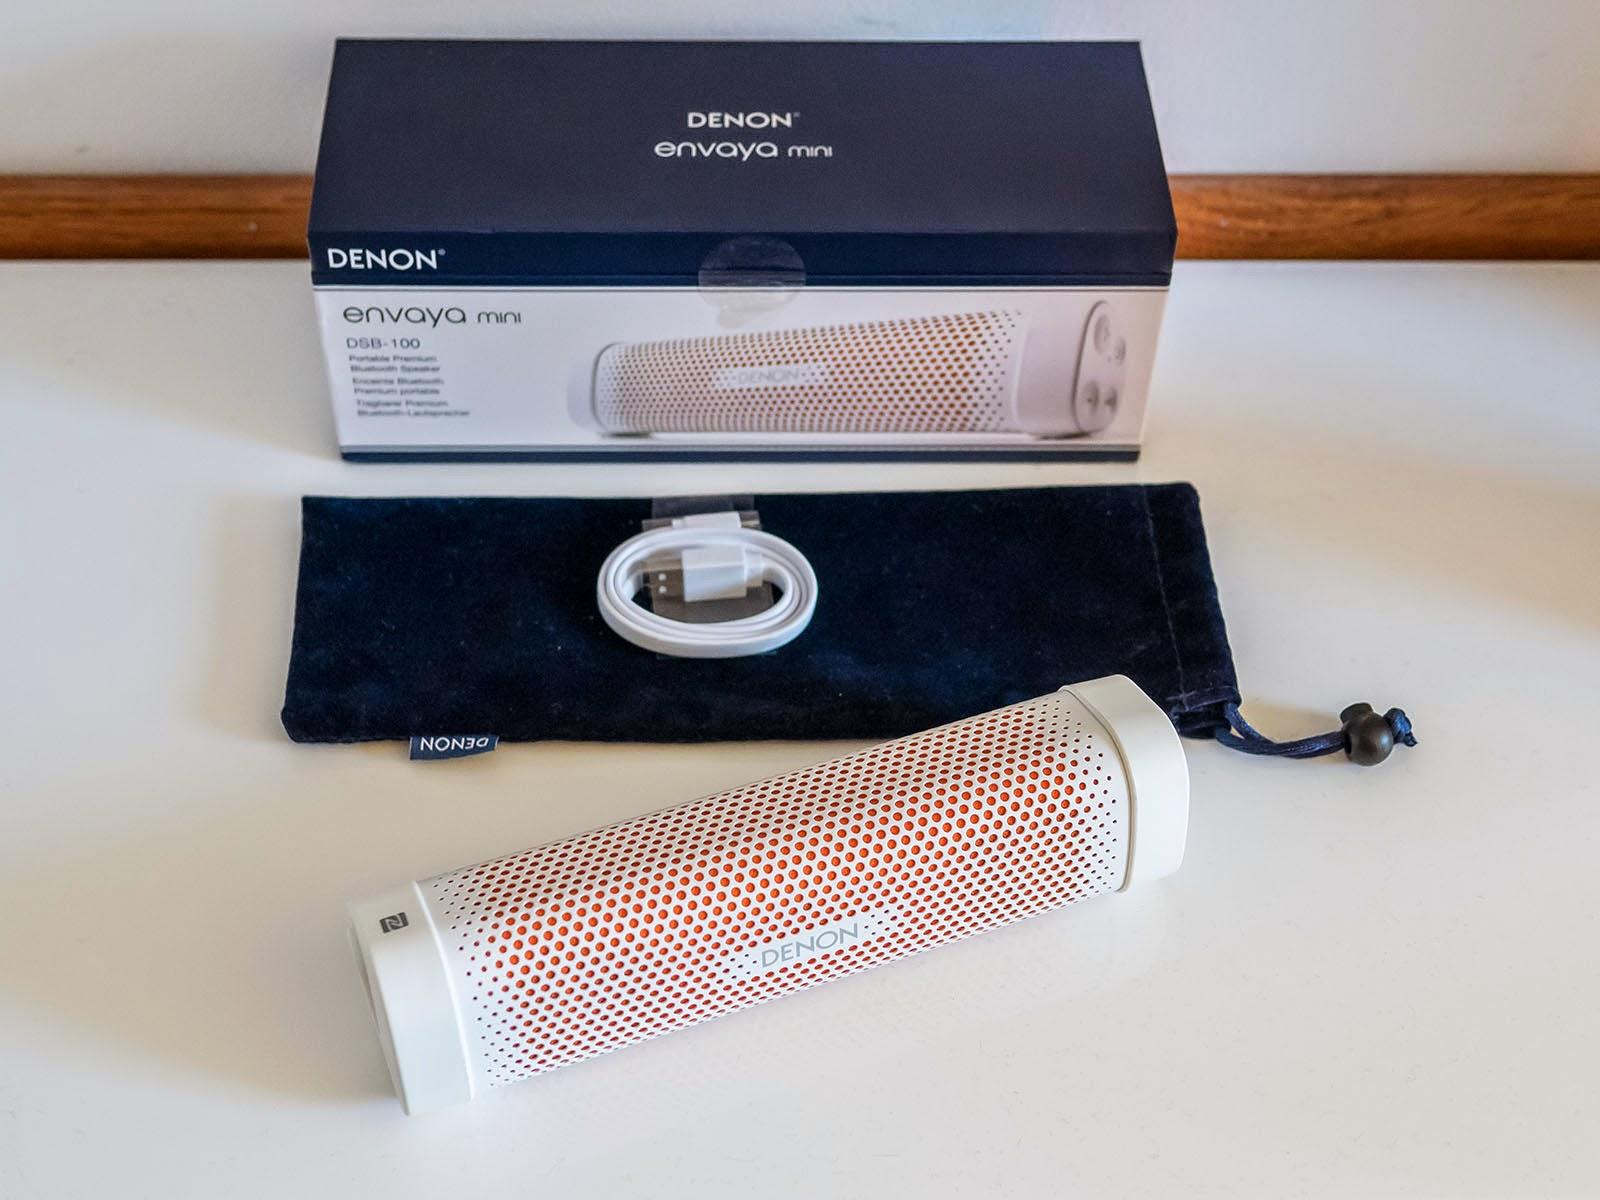 Oluv's Gadgets: Review: Denon Envaya Mini DSB100 - the mini